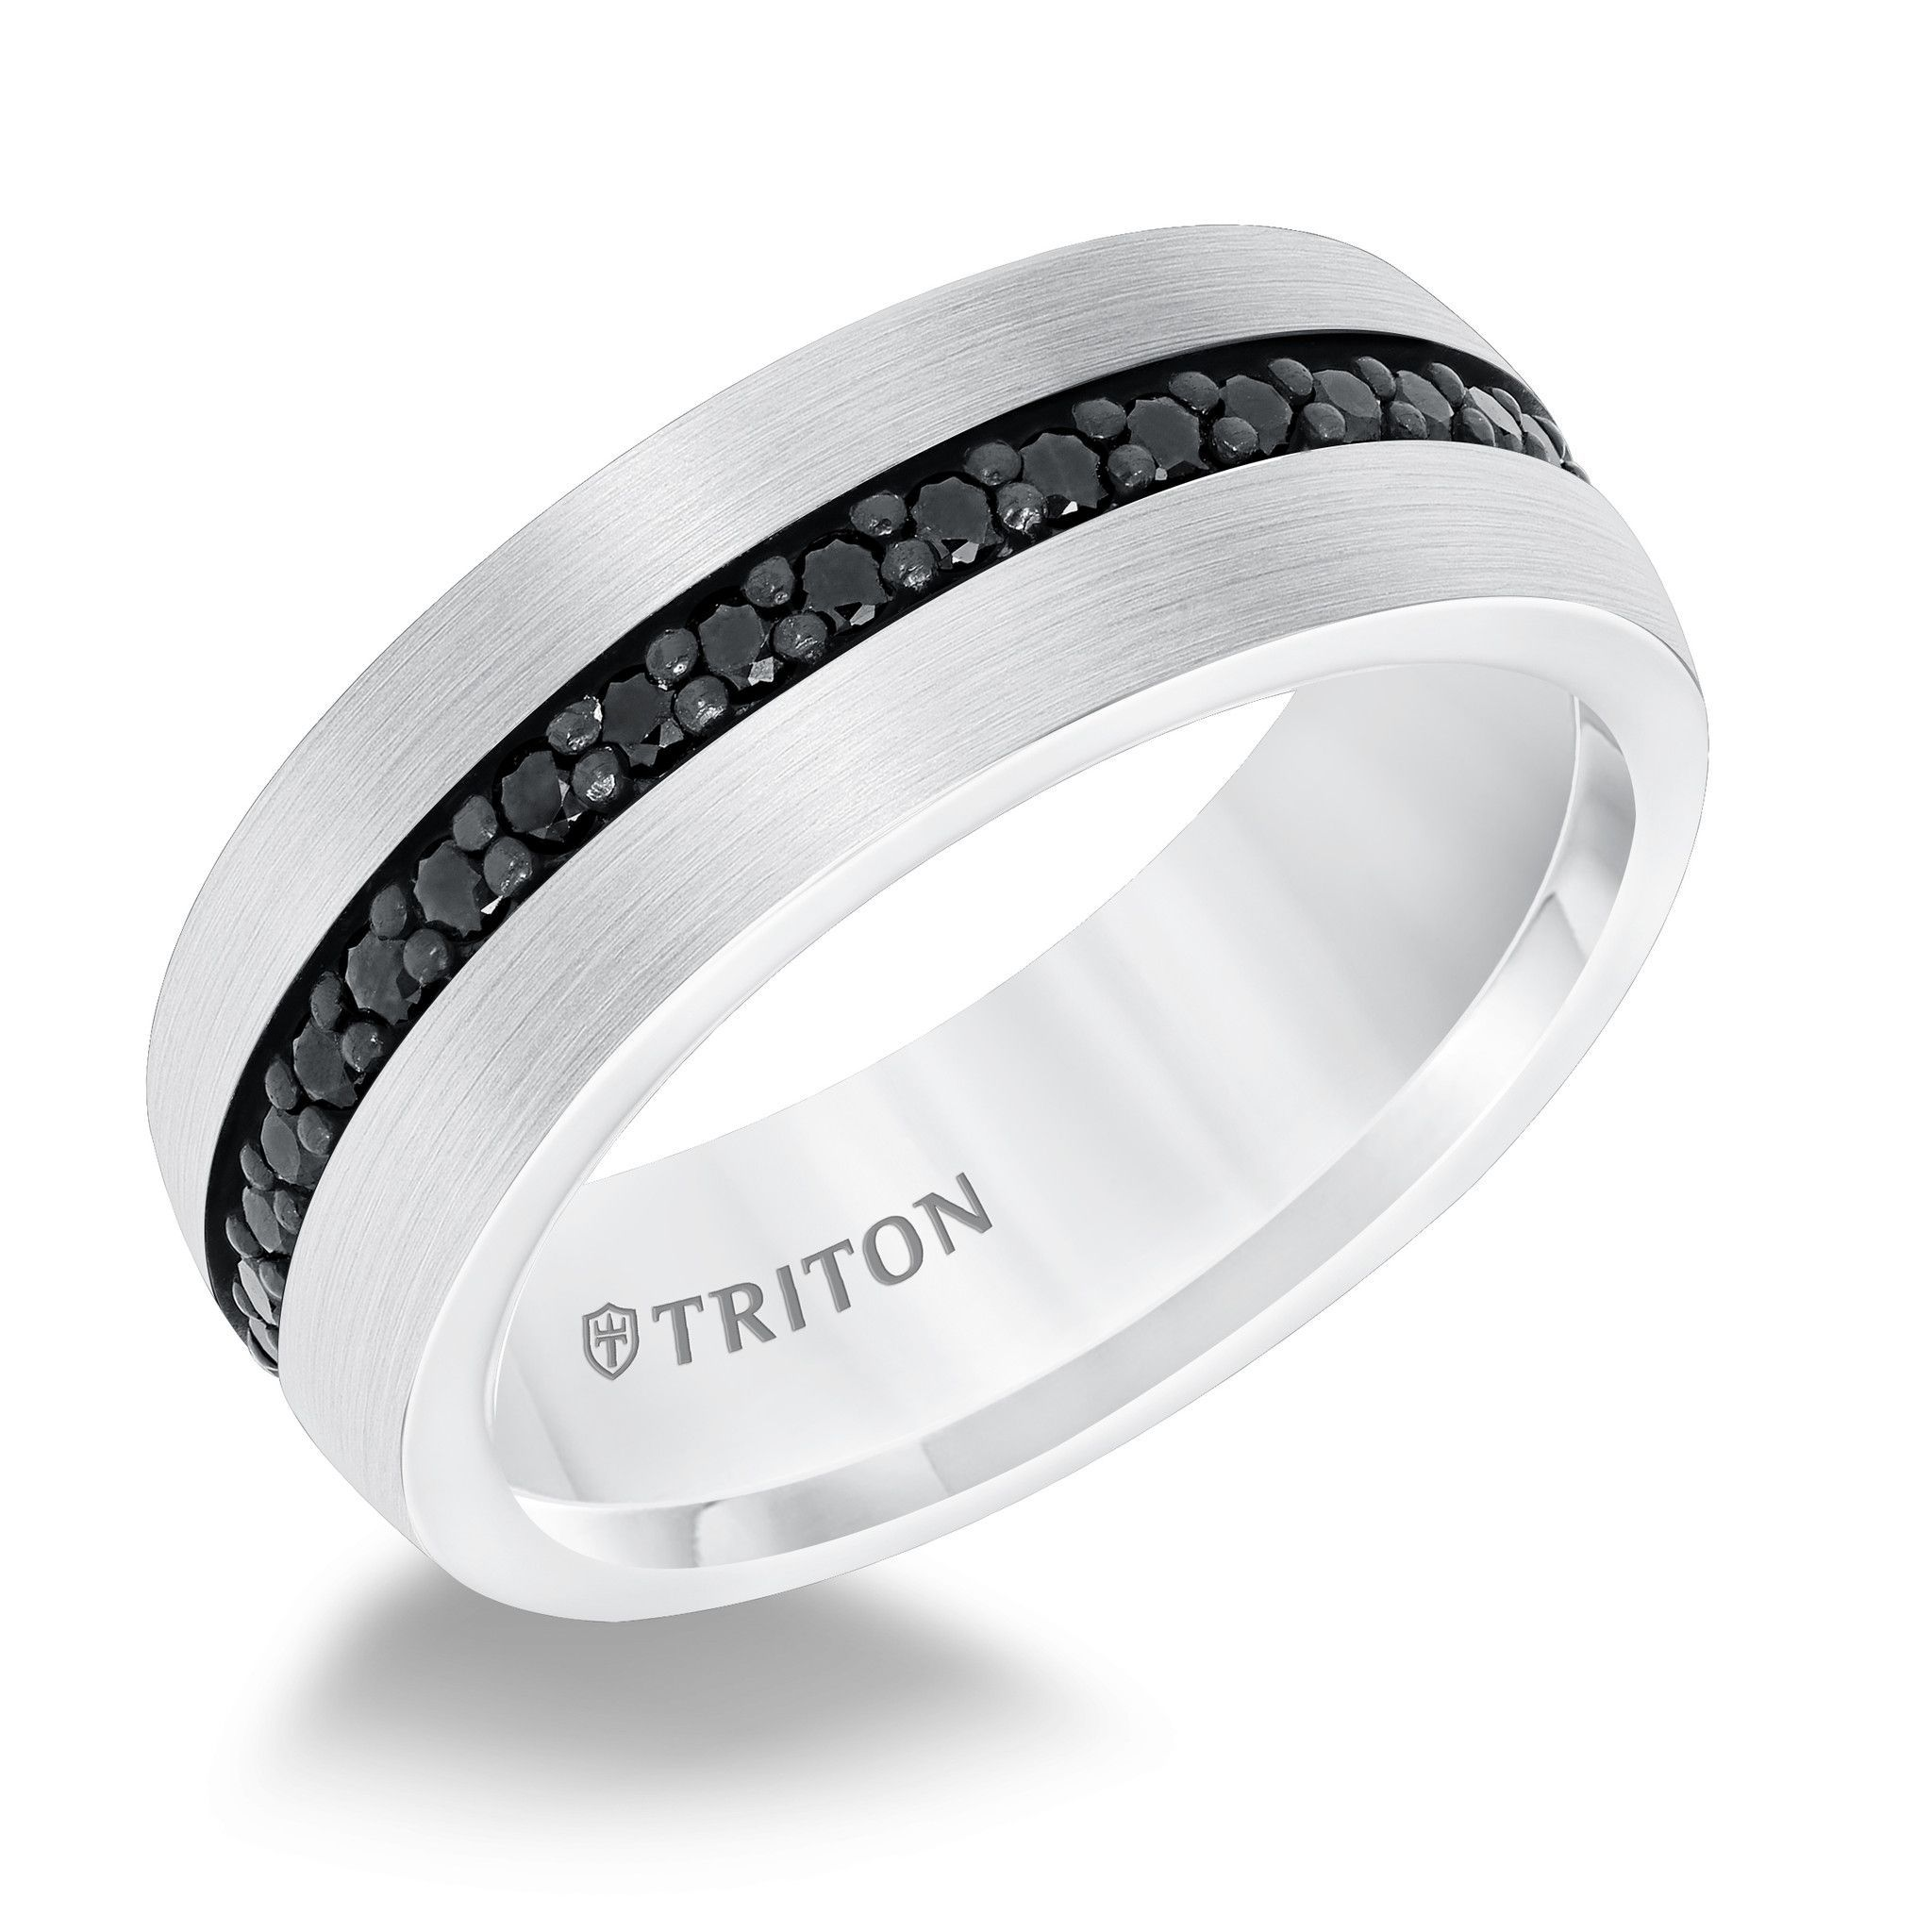 8mm Black Sapphire and White Tungsten Carbide Eternity Wedding